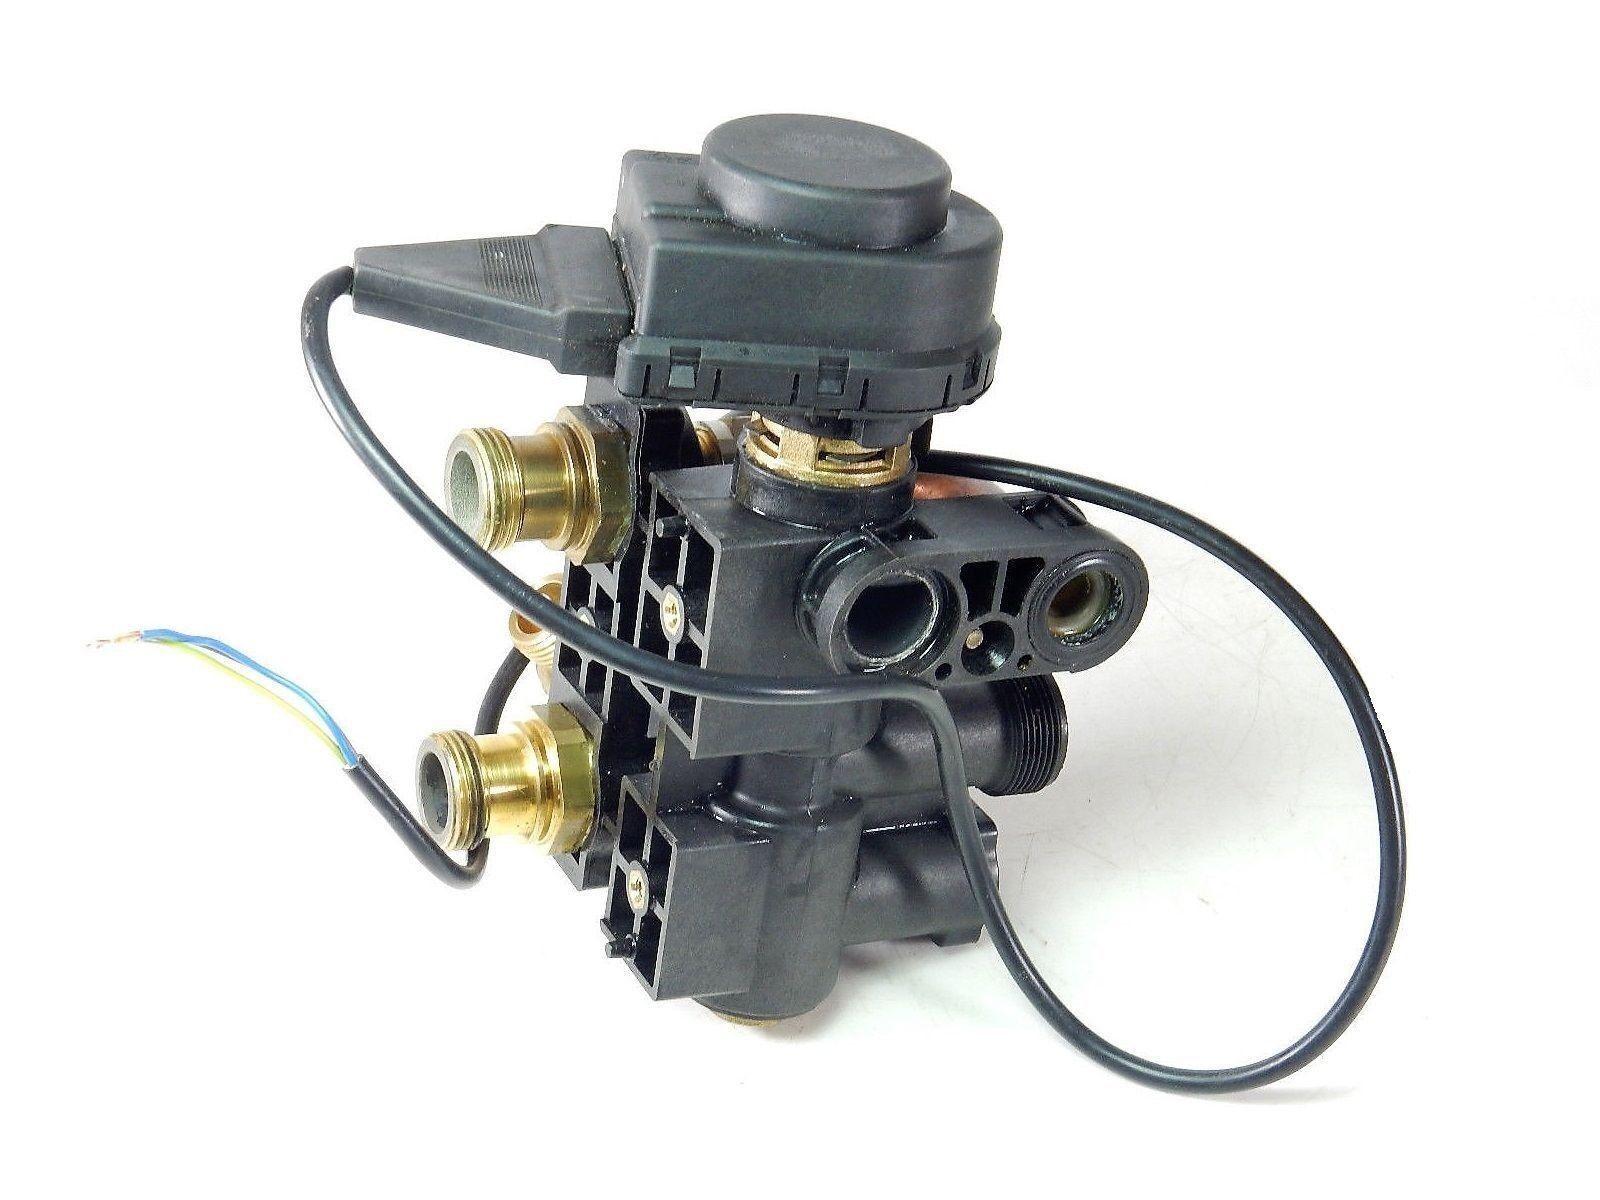 Nice Glow Worm Boiler 30cxi Ornament - Wiring Diagram Ideas ...